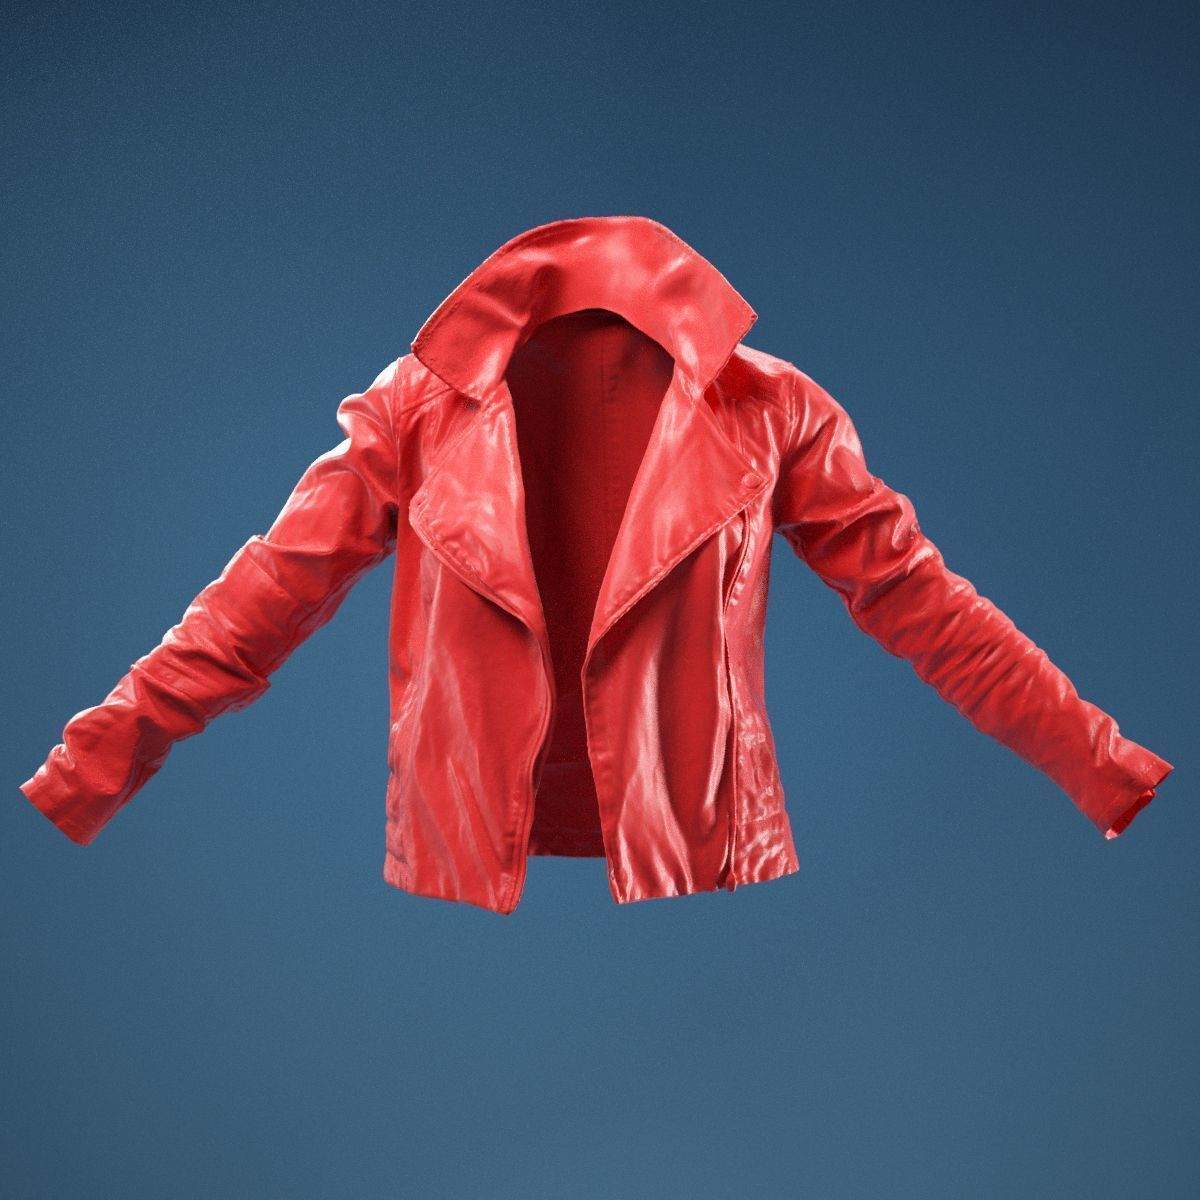 Dark Brown Leather Jacket Open